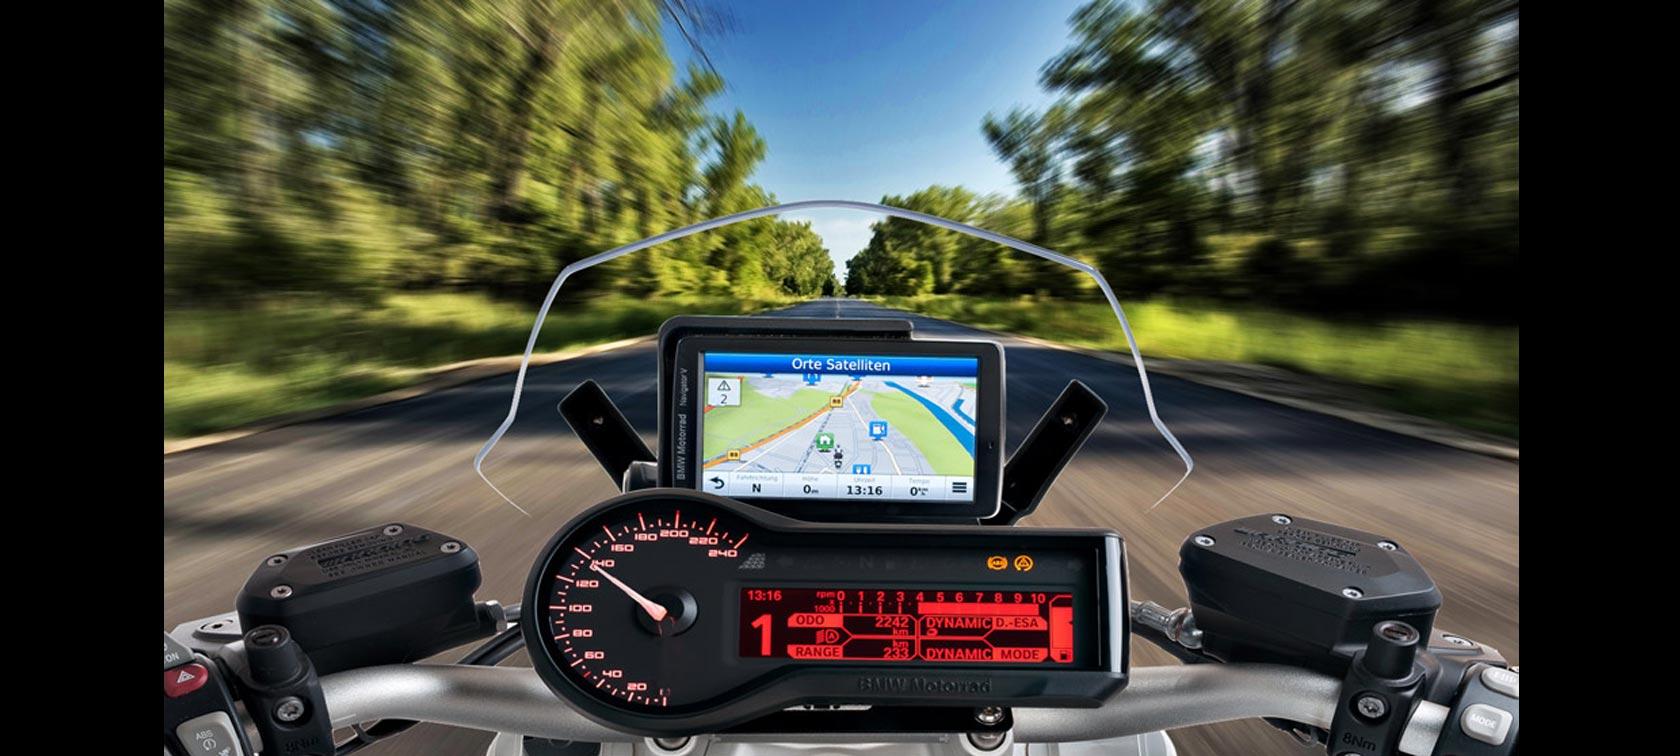 BMW Navigator Training